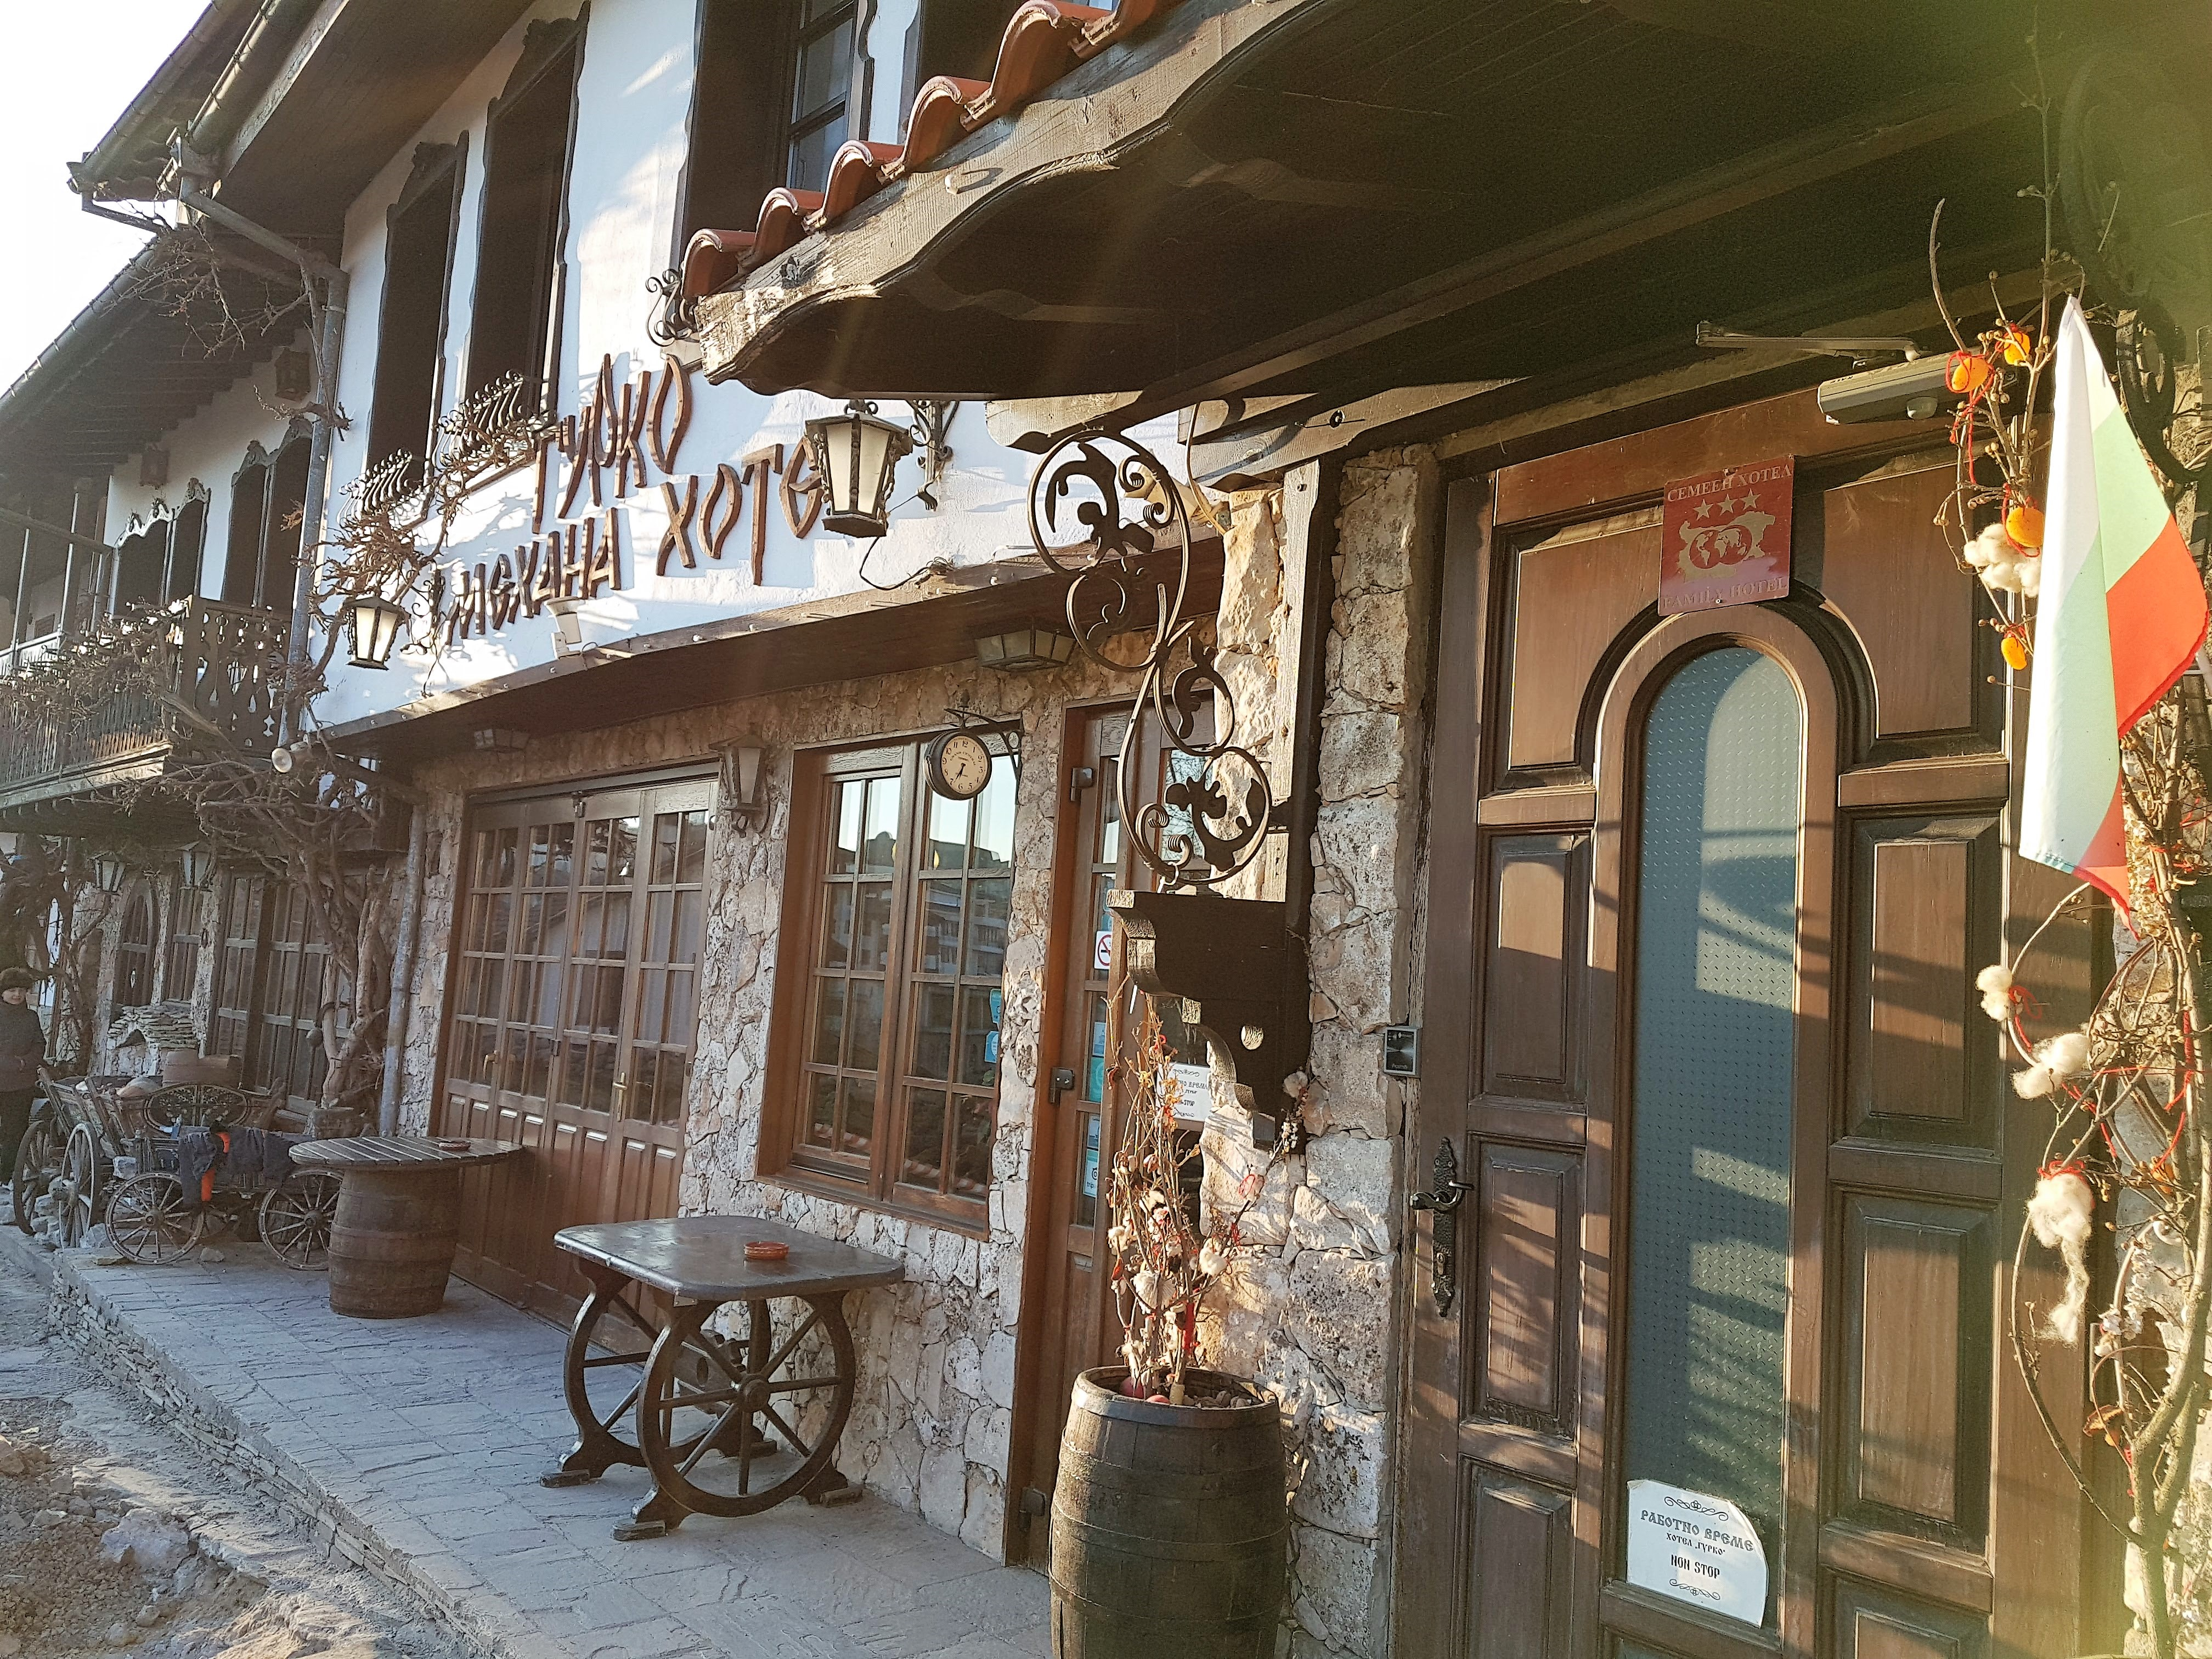 Hotel Gurko, Veliko Tarnovo, placescases.com